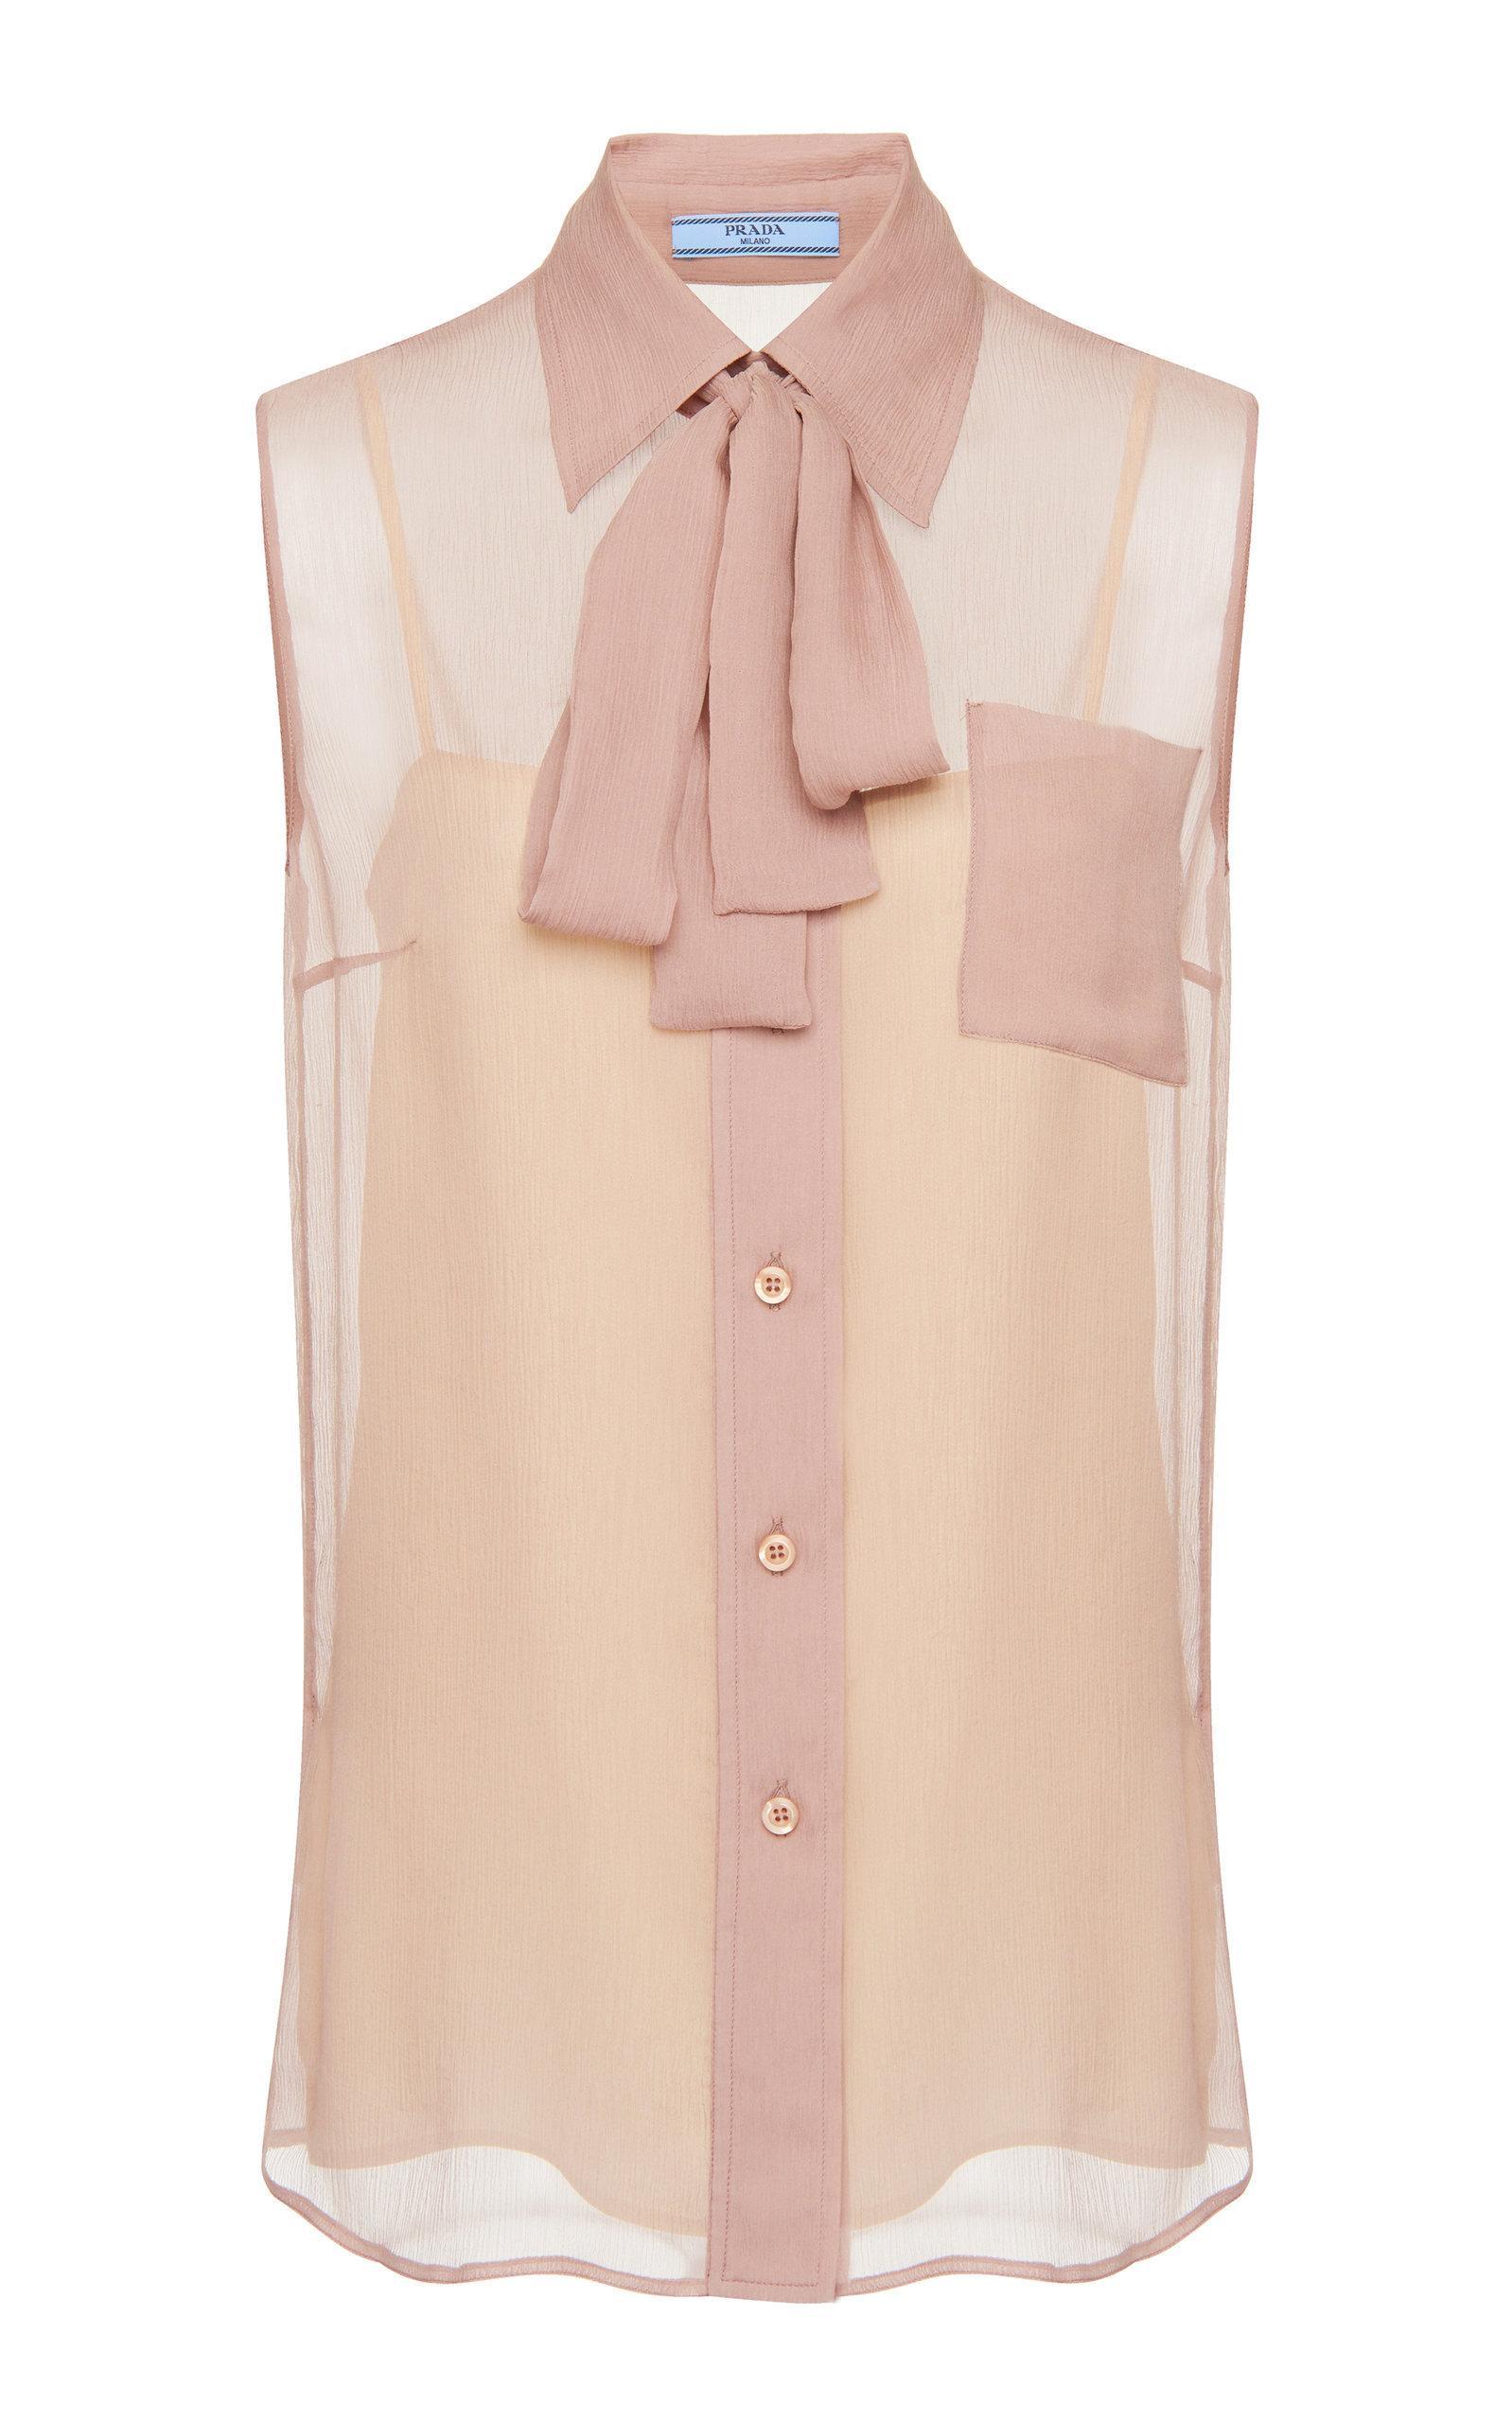 Prada Chiffon Sleeveless Shirt With Pussy Bow In Pink